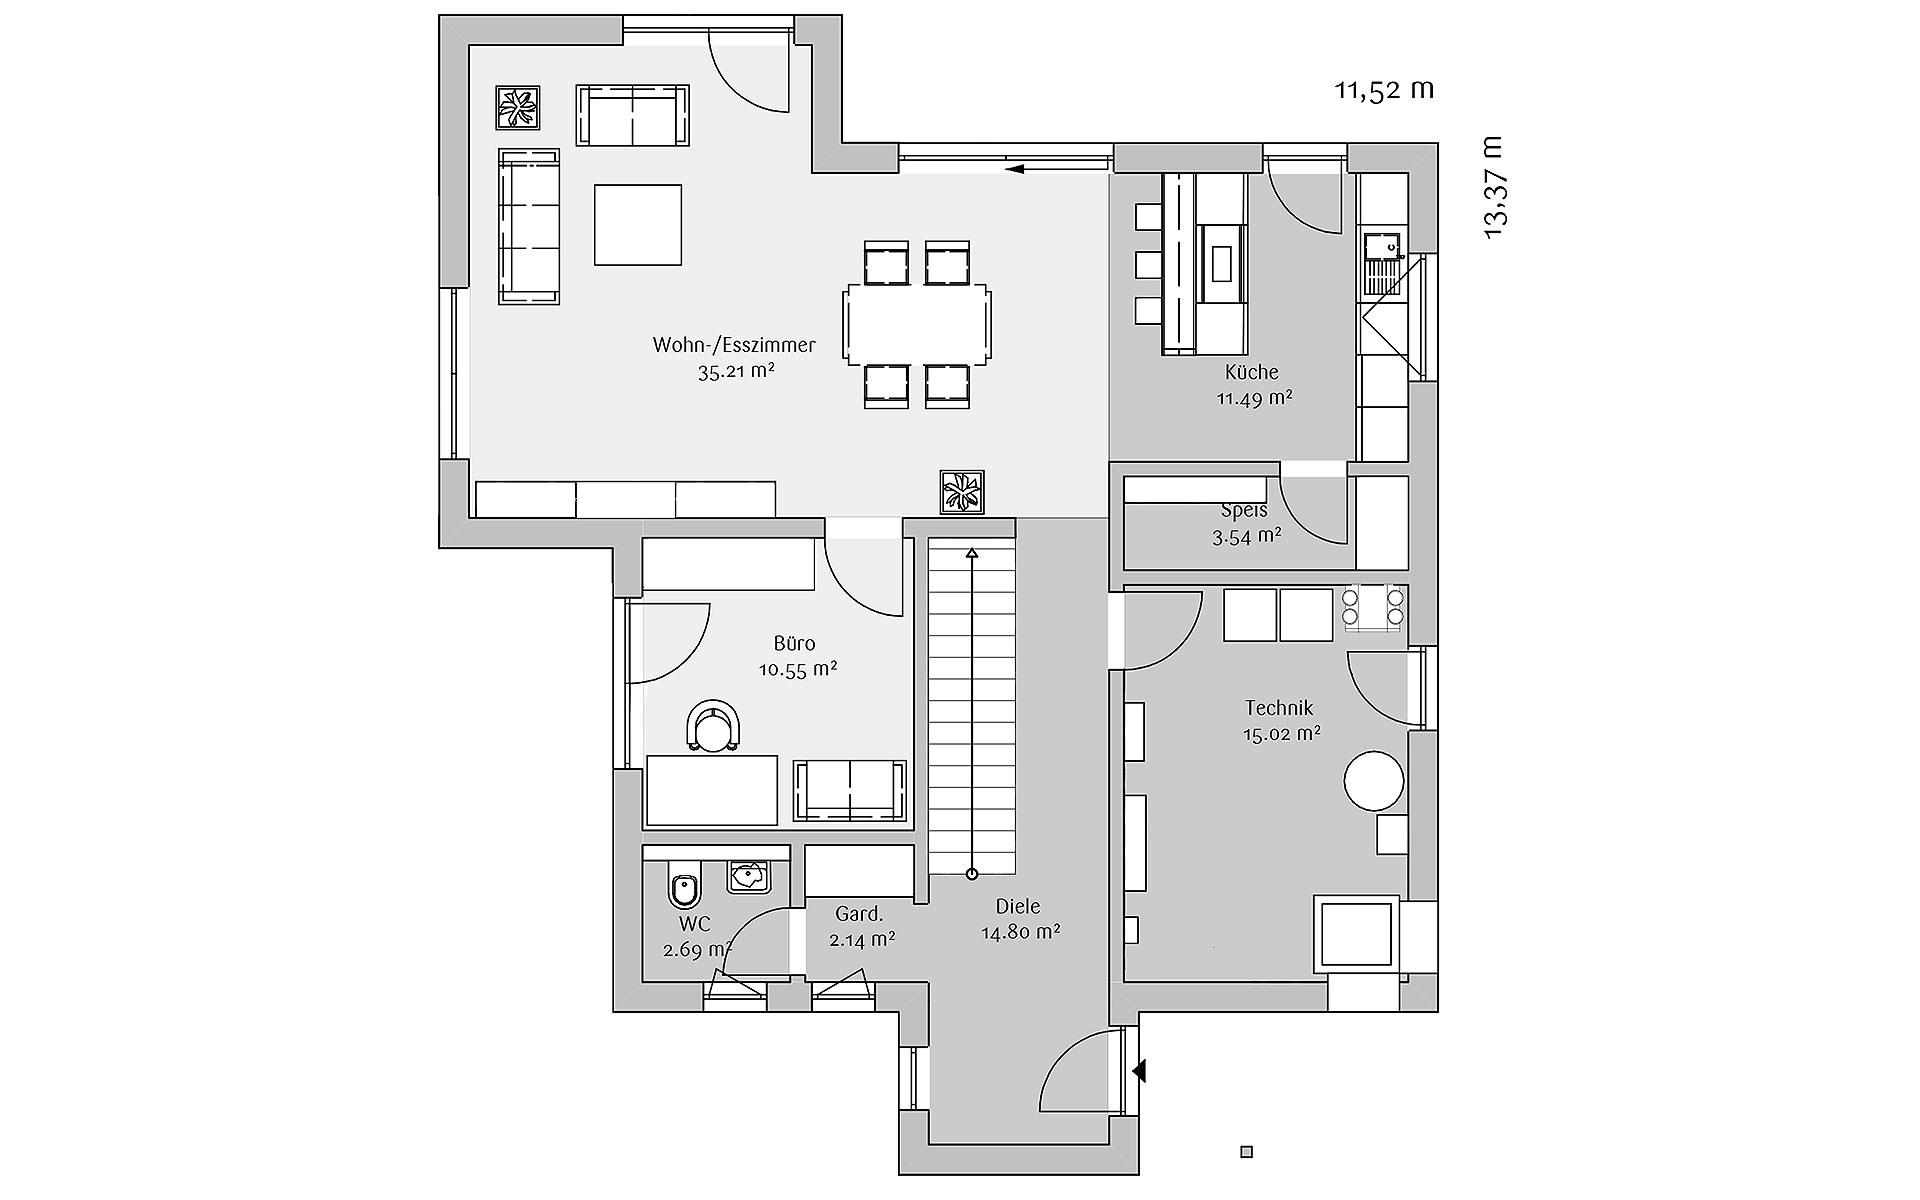 Erdgeschoss Modern 168 von FischerHaus GmbH & Co. KG